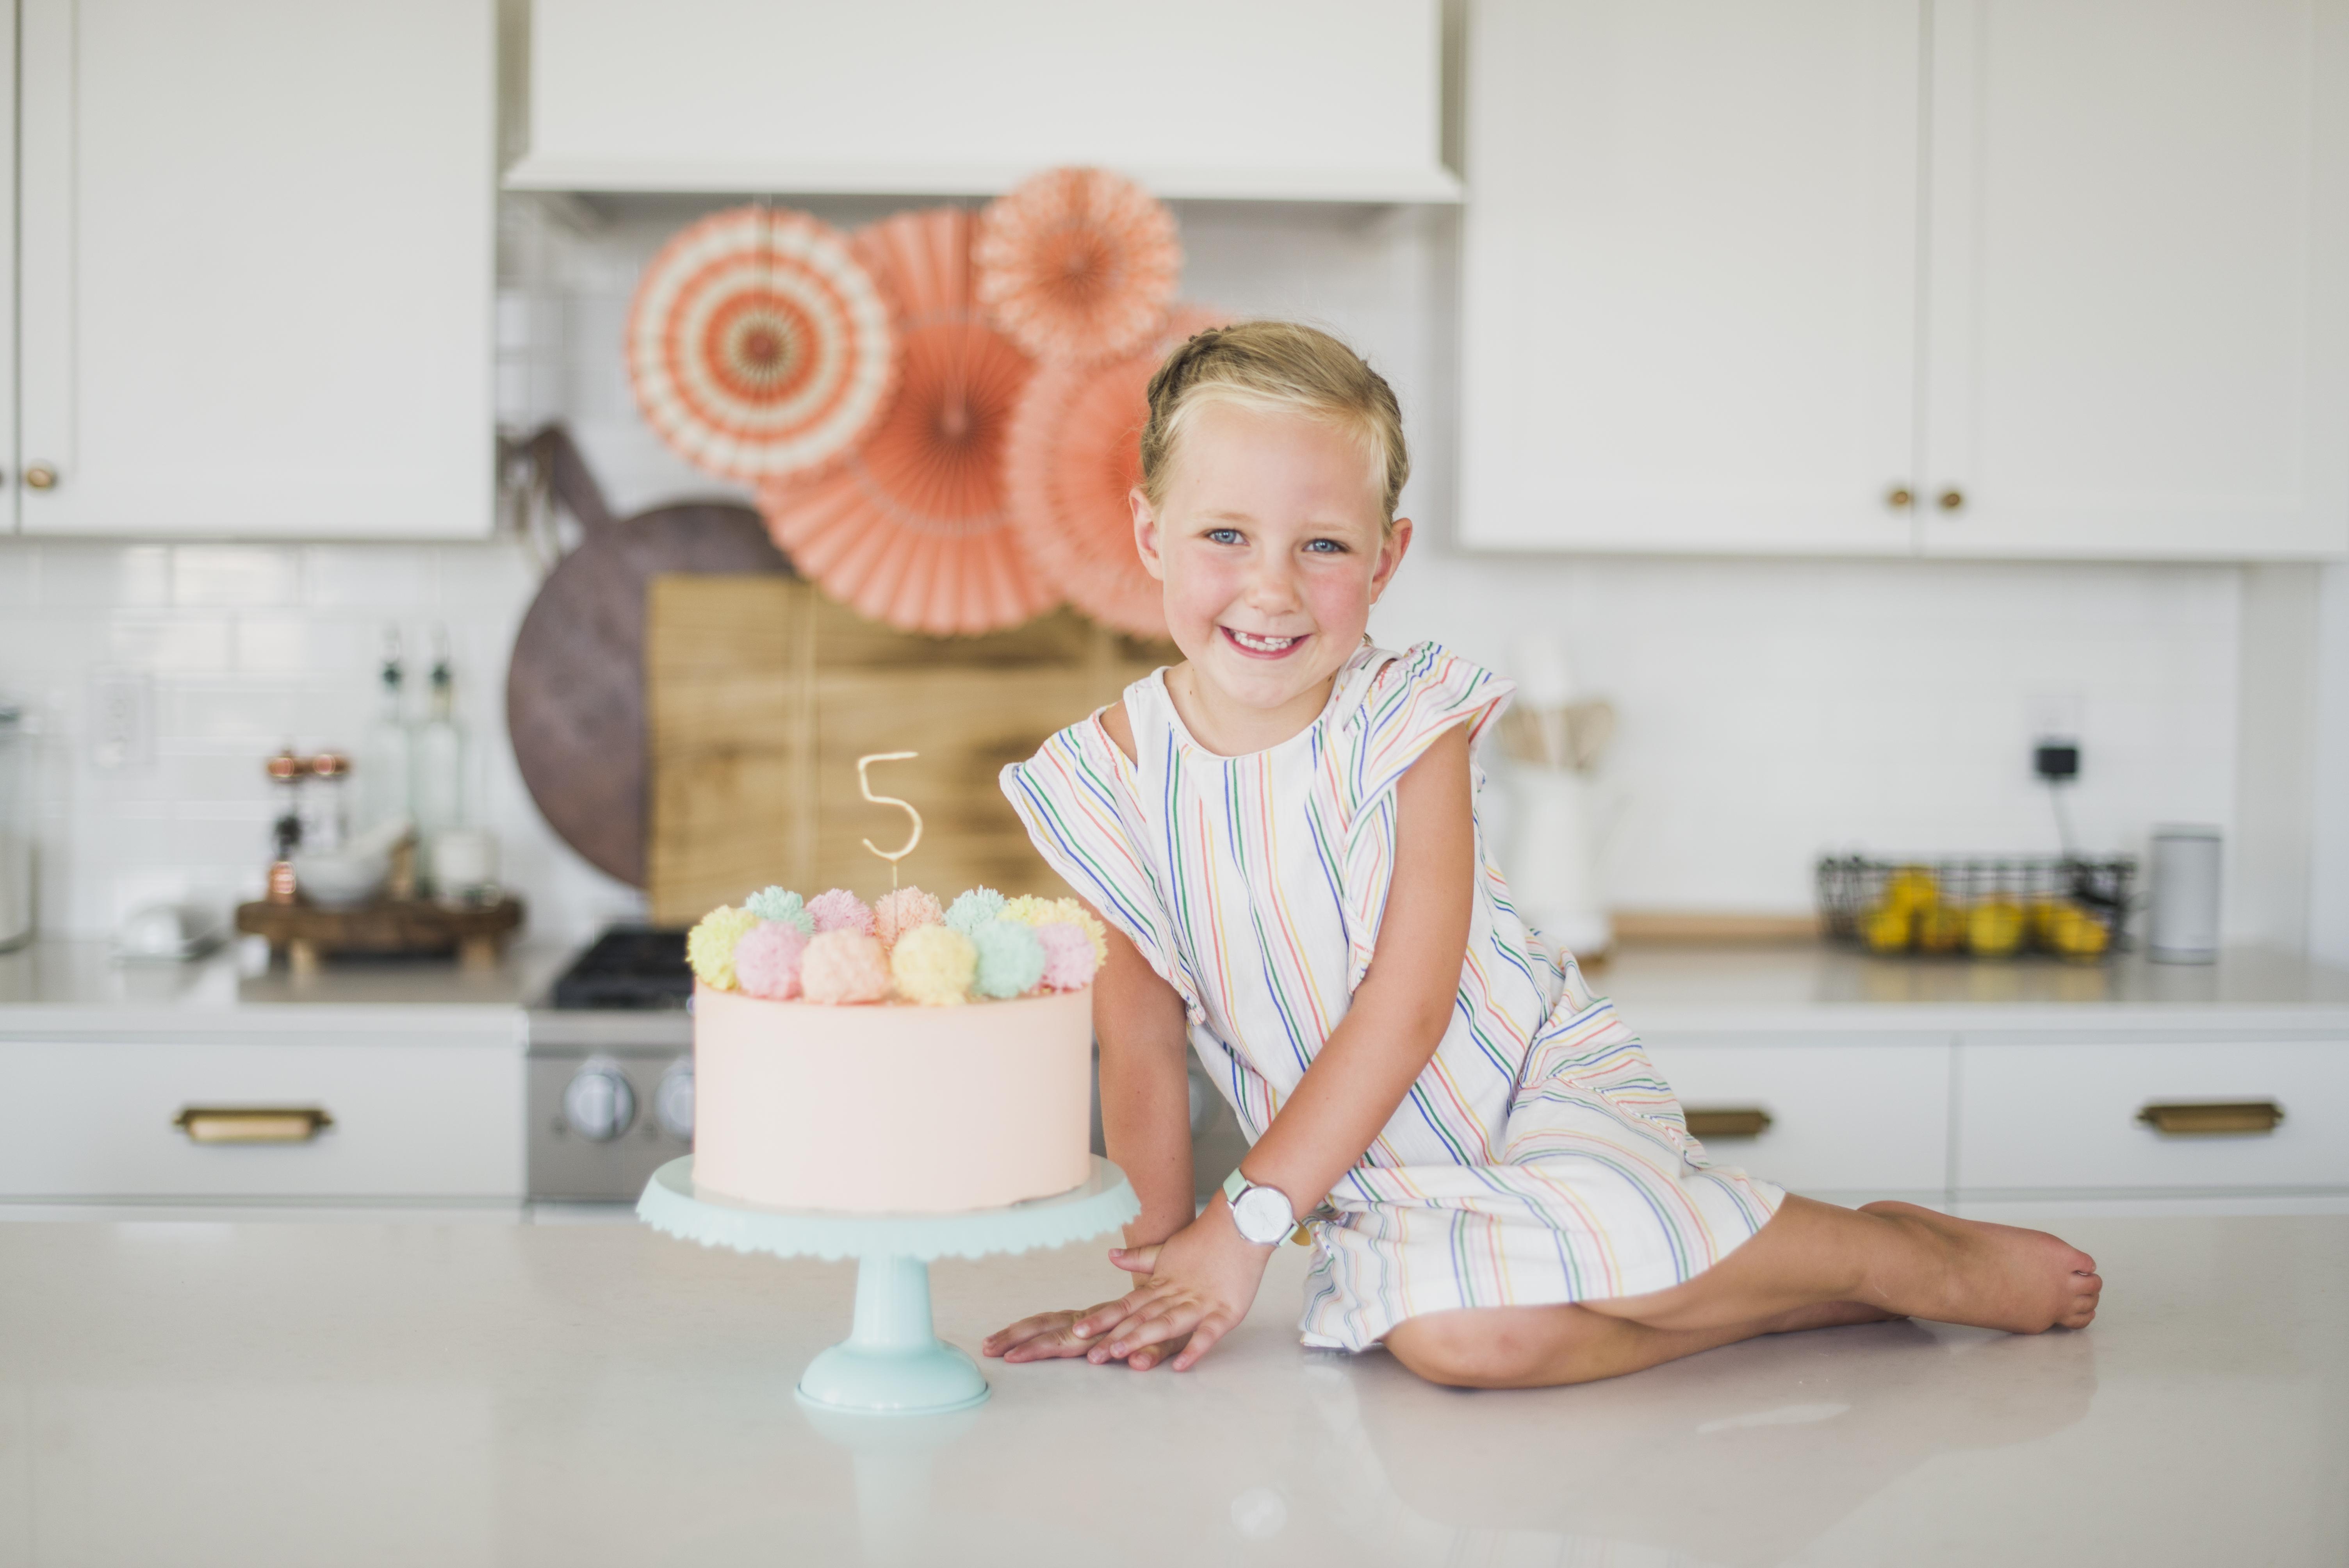 Pom pom cake #pompomcake #birthdaycake #birthdayidea